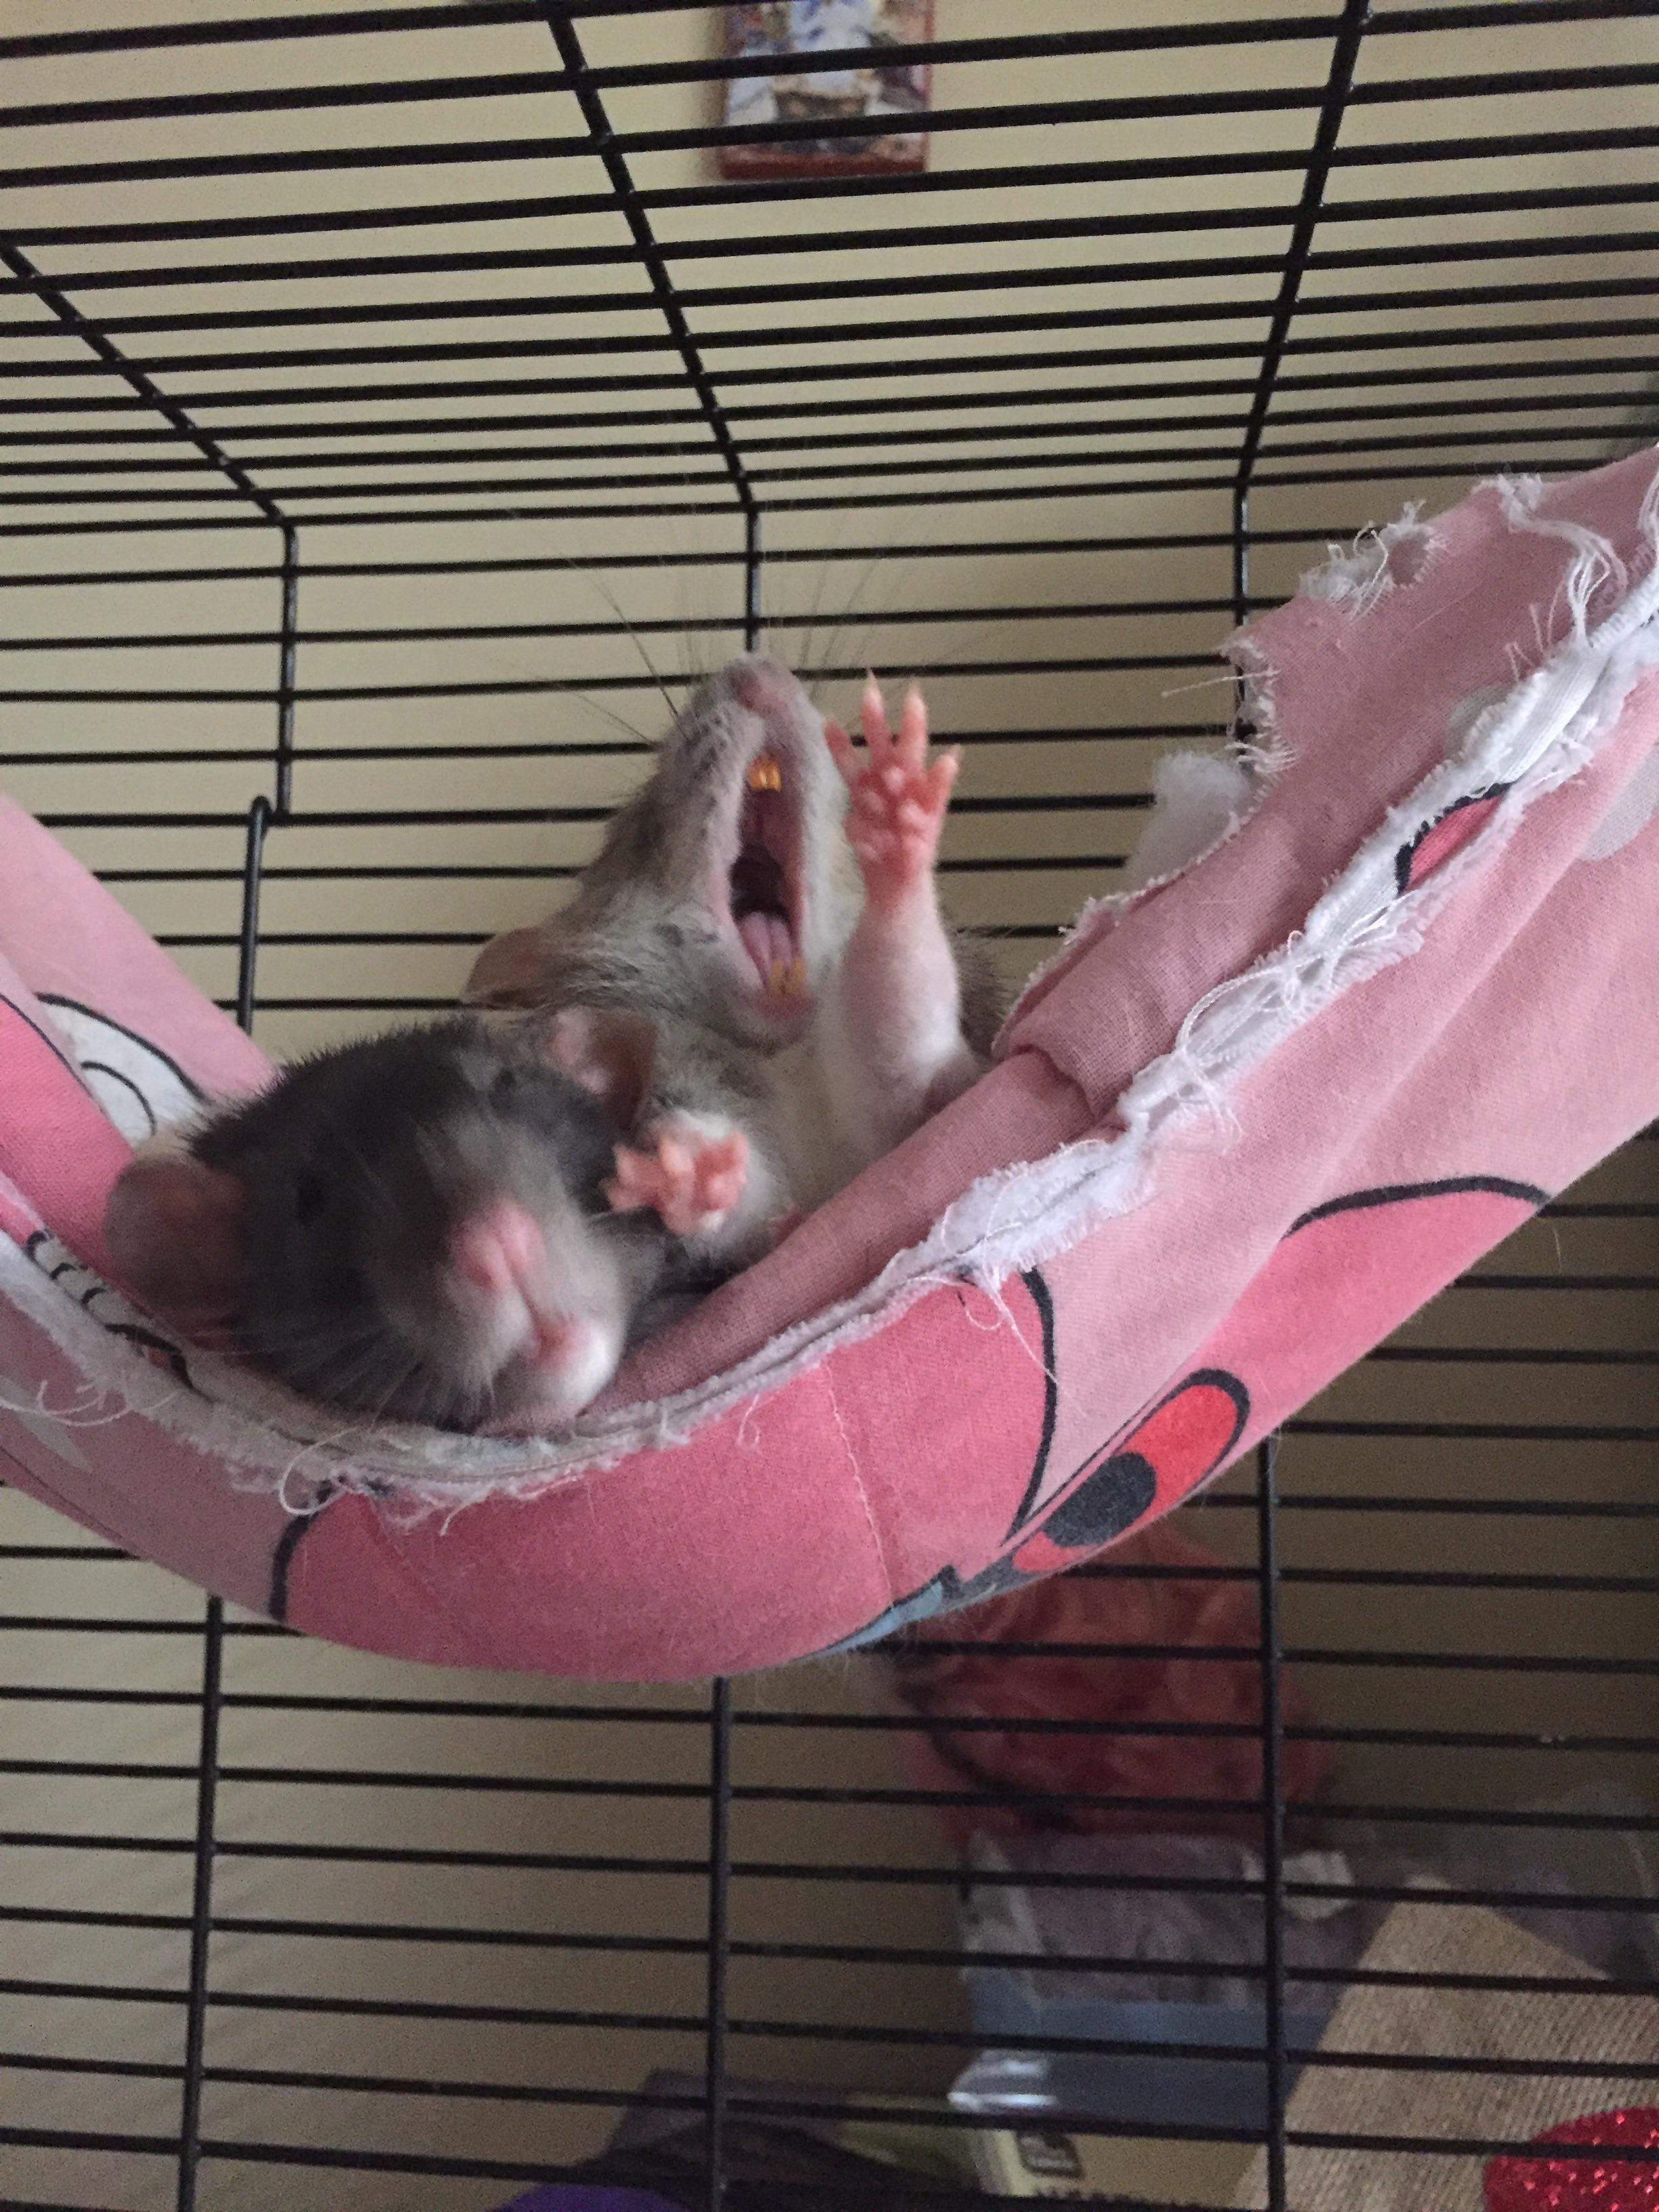 Big Yawn Small Ratto Aww Cute Rat Cuterats Ratsofpinterest Cuddle Fluffy Animals Pets Bestfriend Ittssofluffy B Beste Vrienden Knaagdieren Beestjes